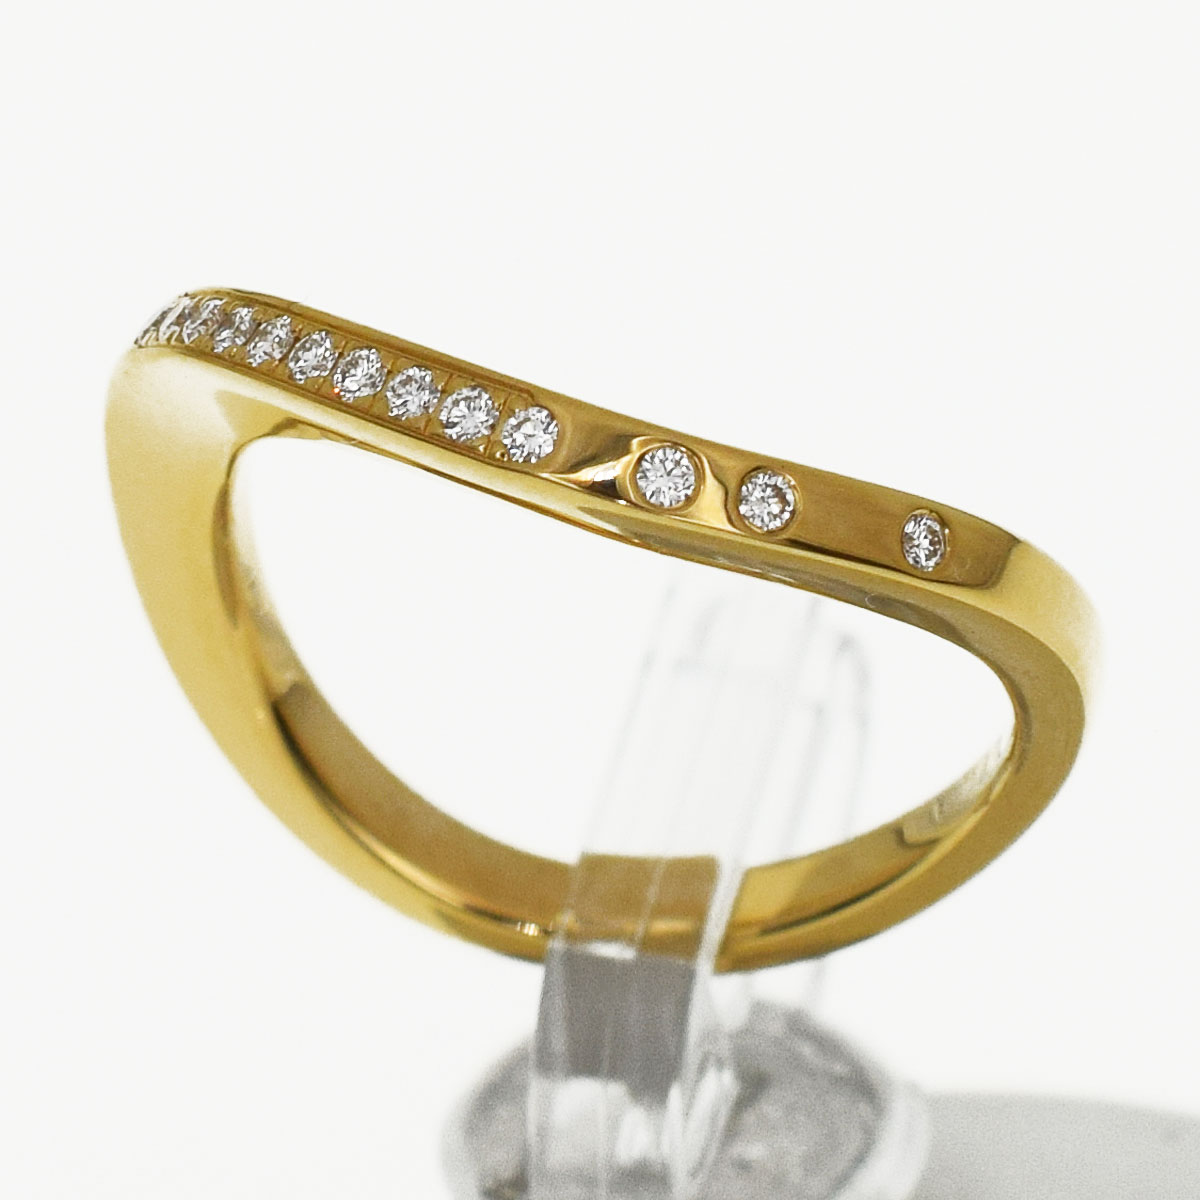 Cartier カルティエ ダイヤ パリ ヌーベルバーグ リング 750 K18 YG イエローゴールド 日本サイズ約8号 #48【送料無料】【代引き手数料無料】指輪 レディース【中古】30871201